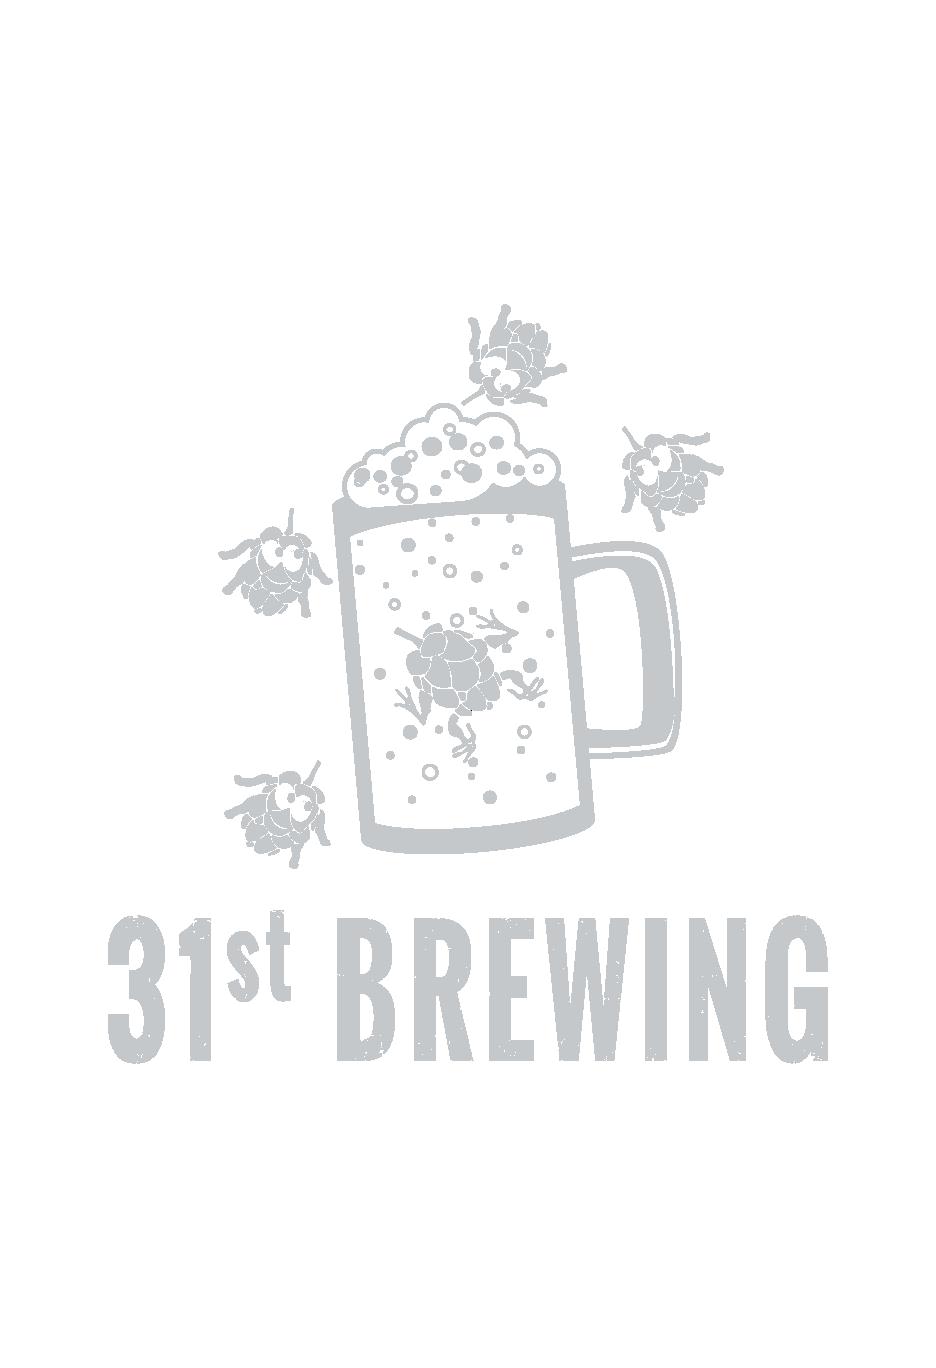 Lagunitas — 31st Brewing